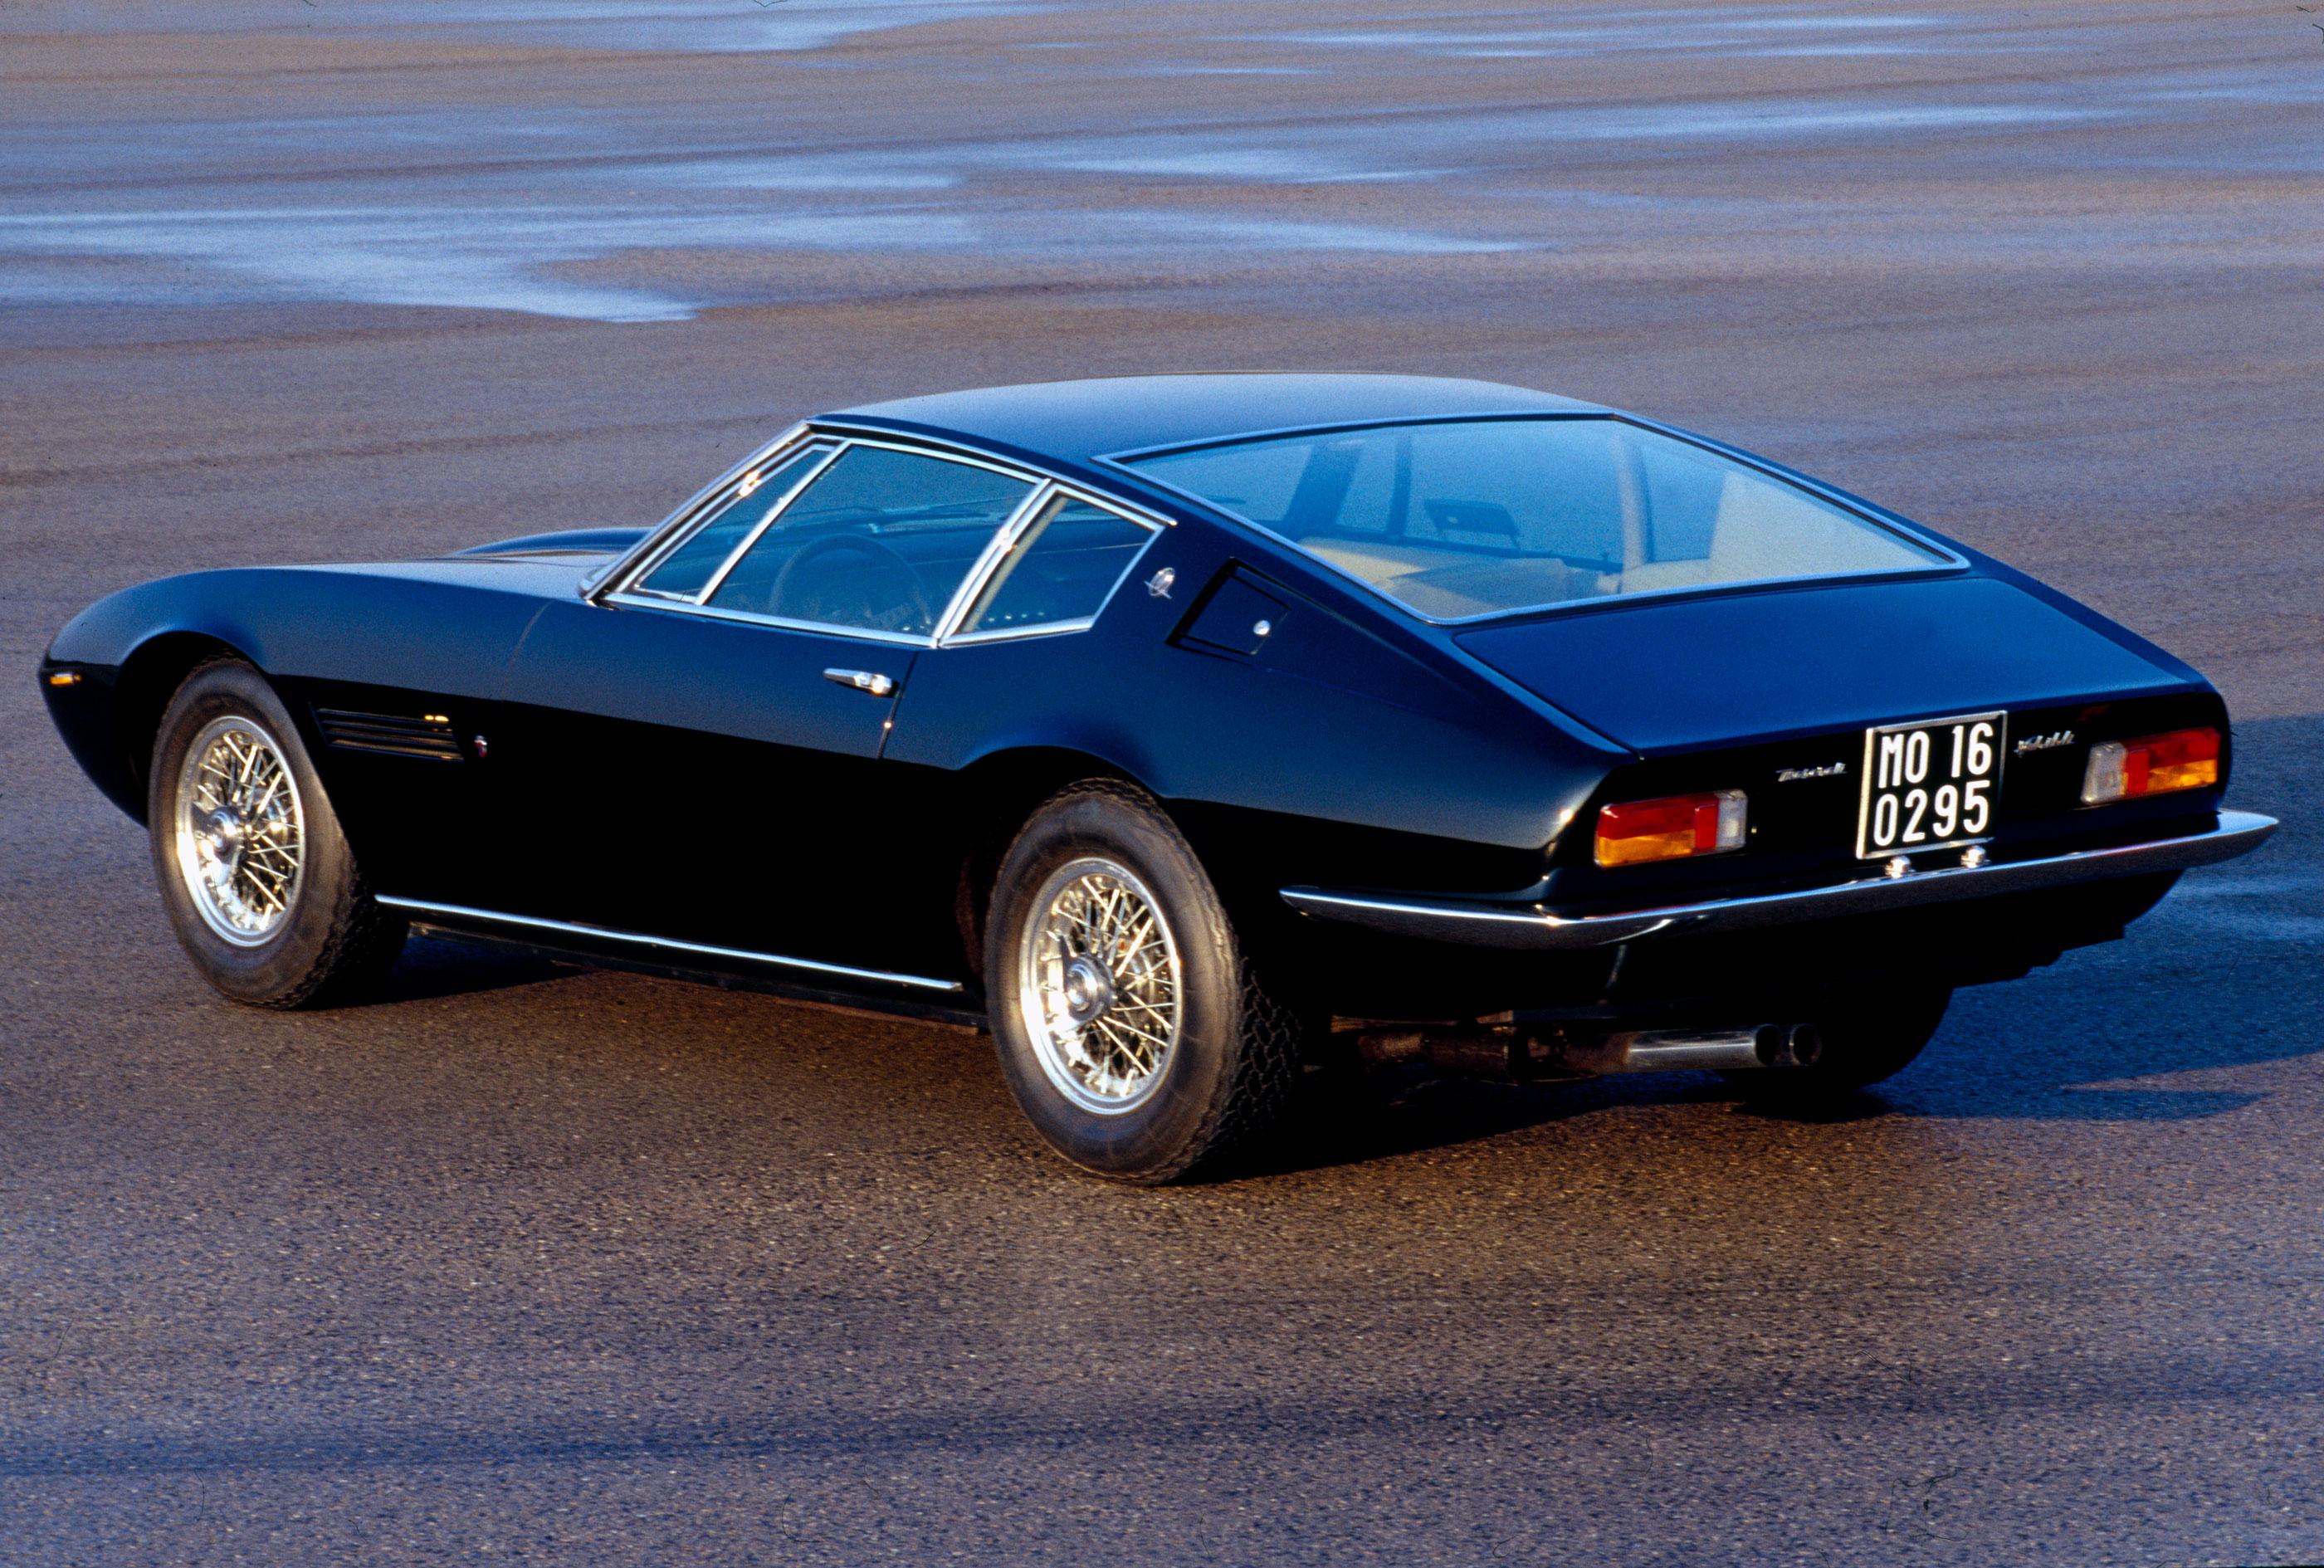 Maserati Ghibli rear 3/4